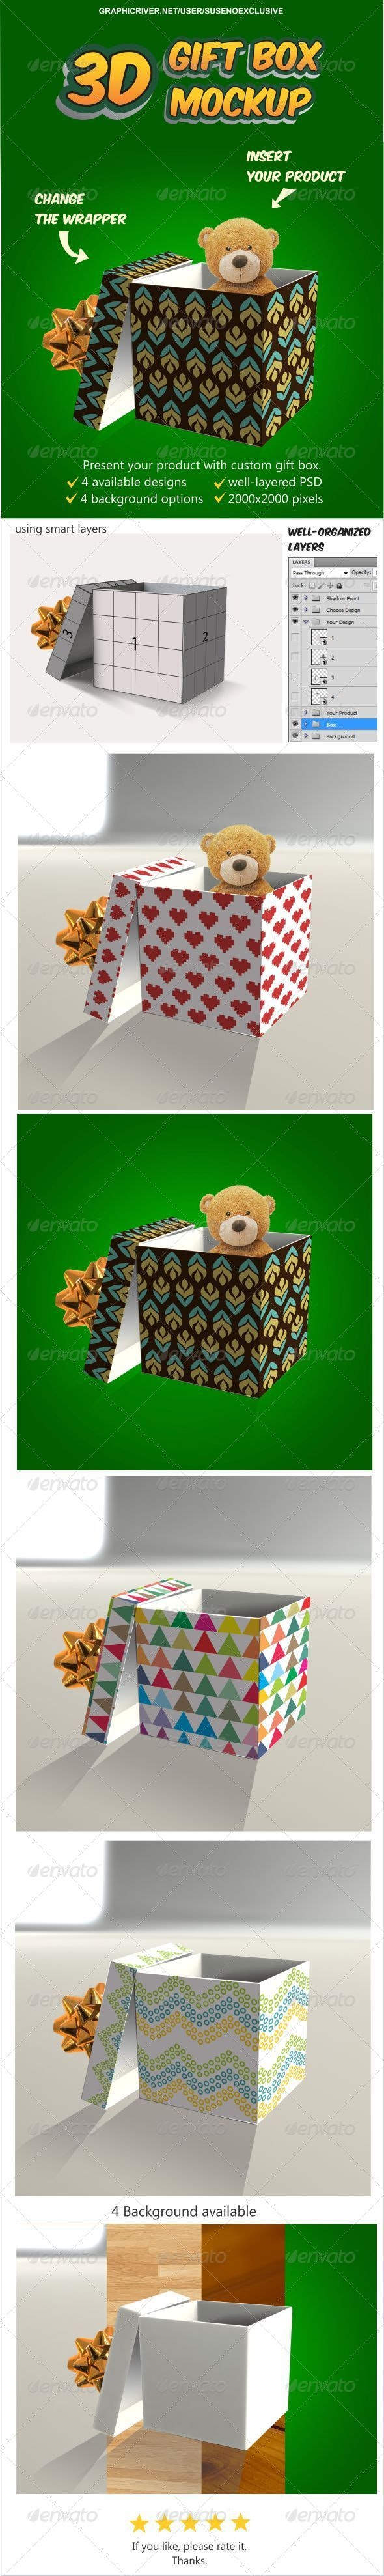 3D Gift Box Mockup - Miscellaneous Print